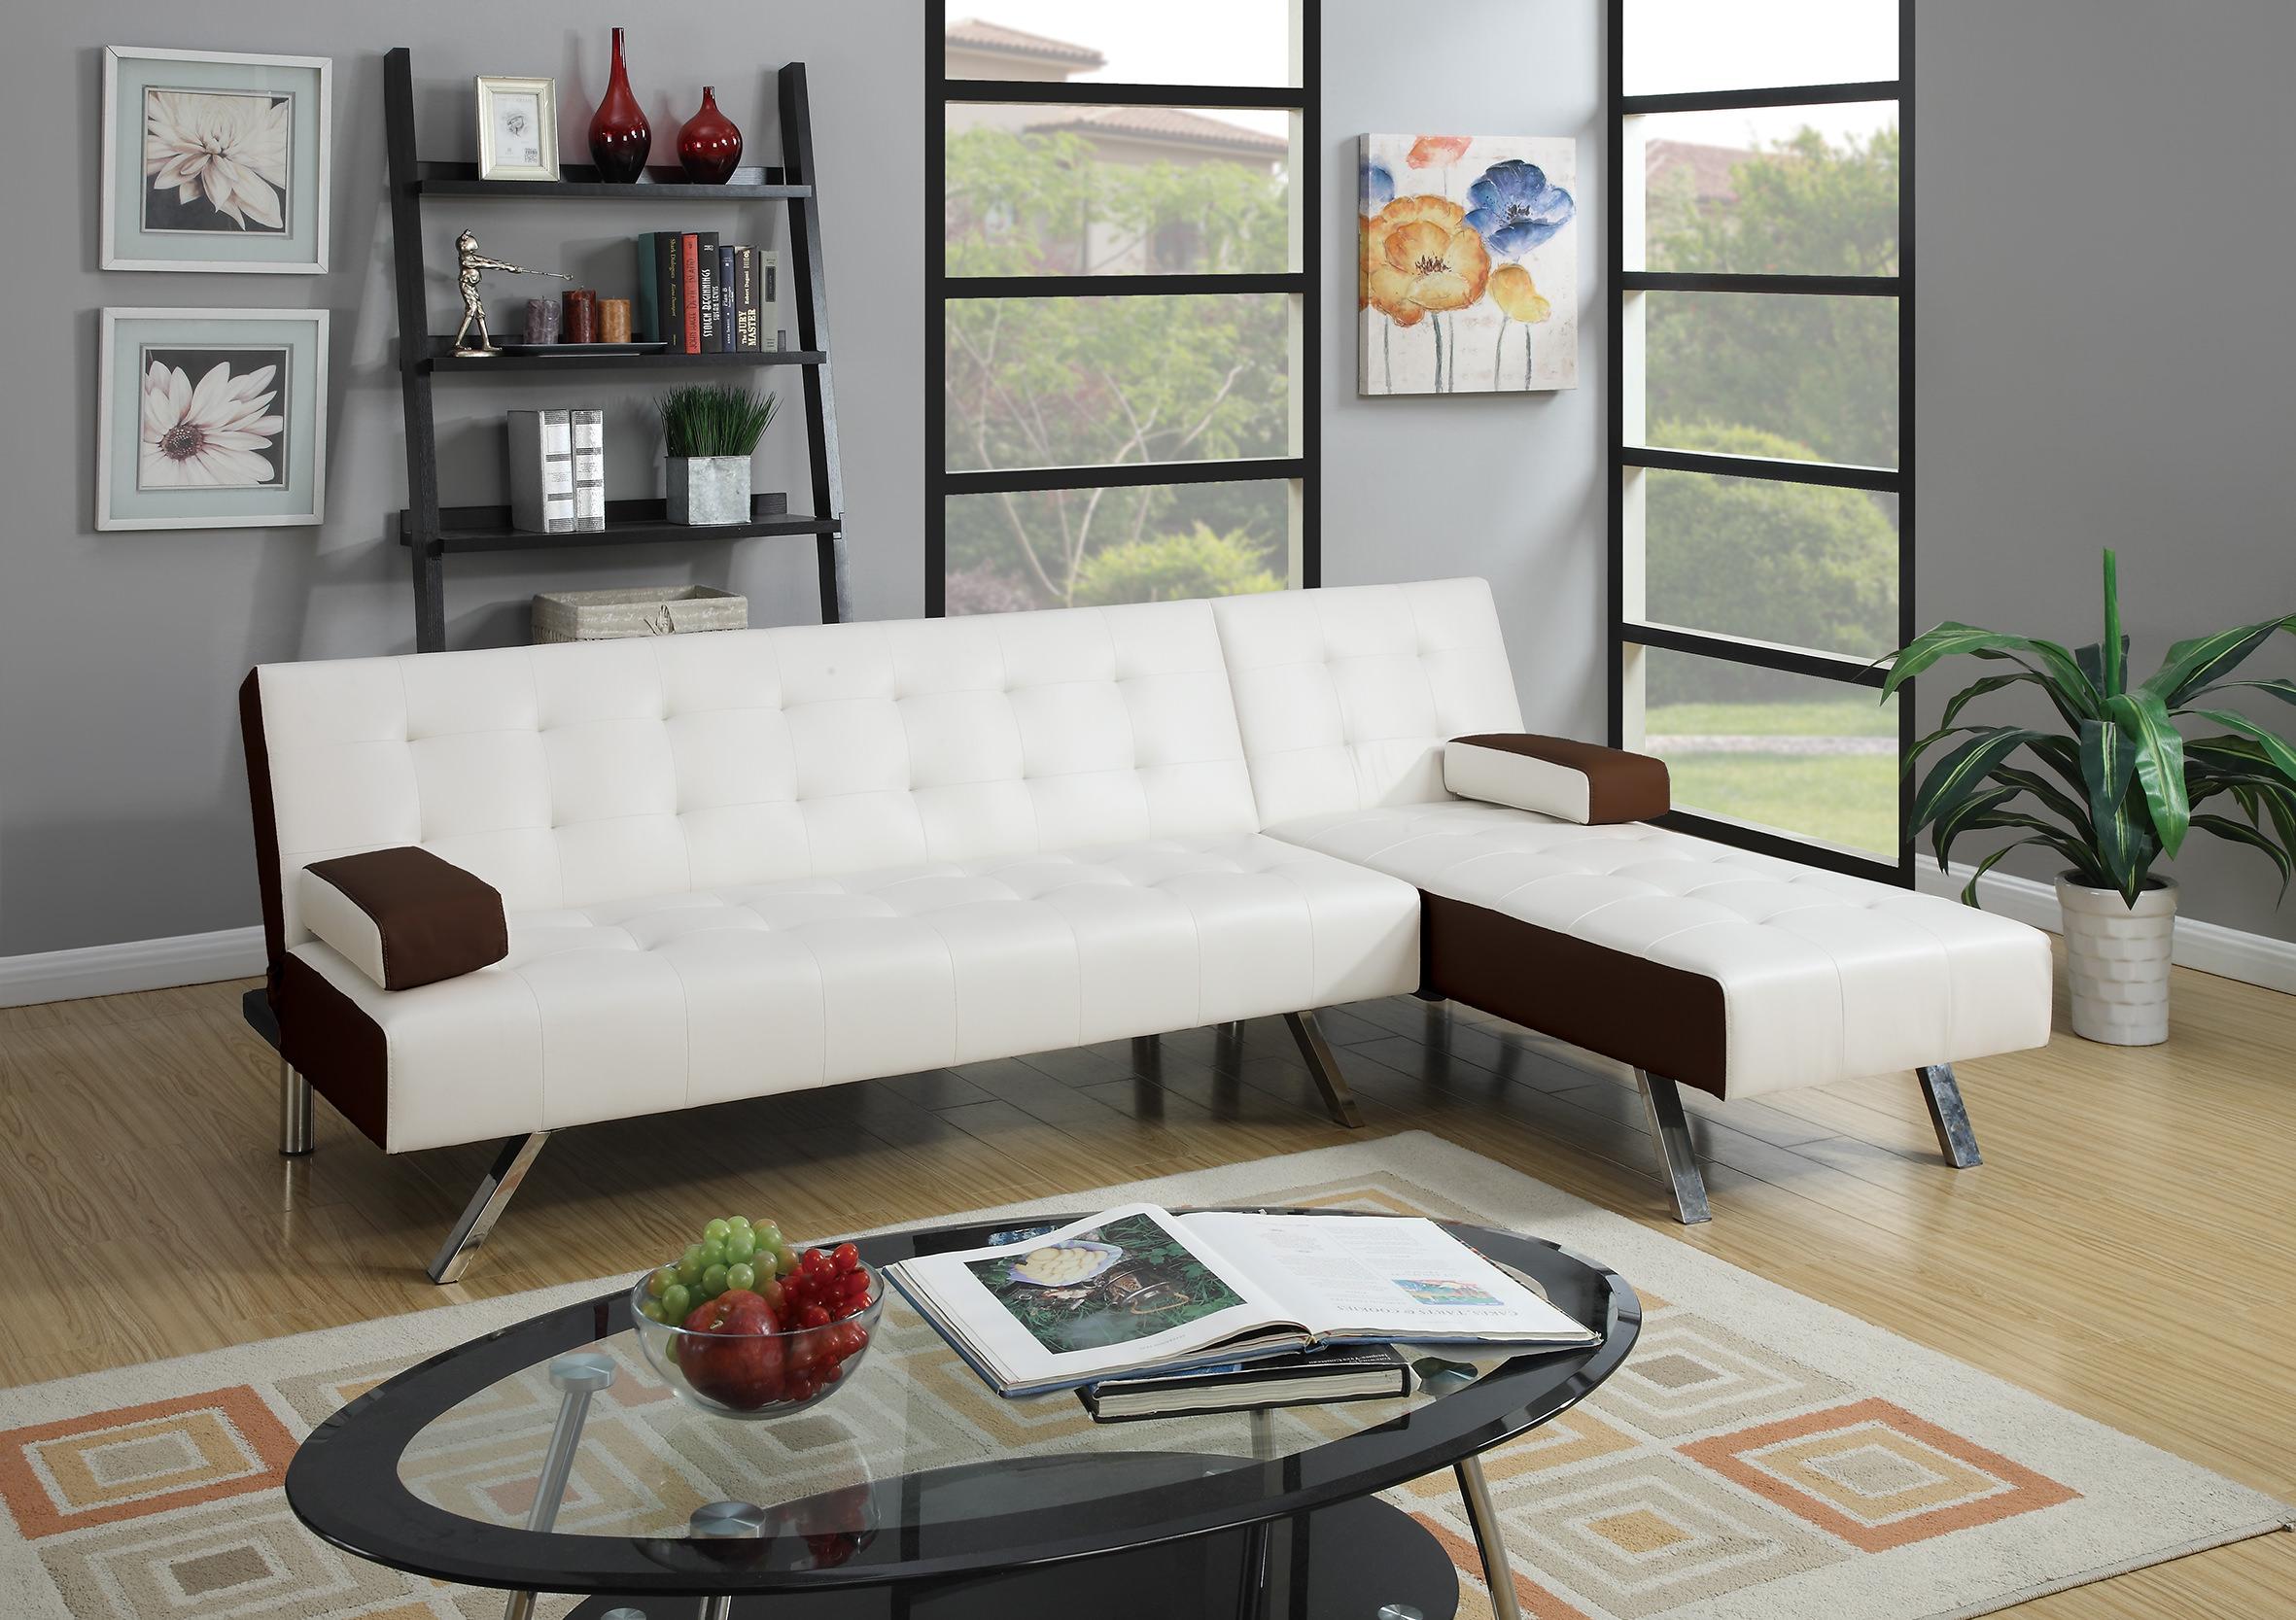 F7887 White 2 Pcs Convertible Sectional Sofa Set by Poundex